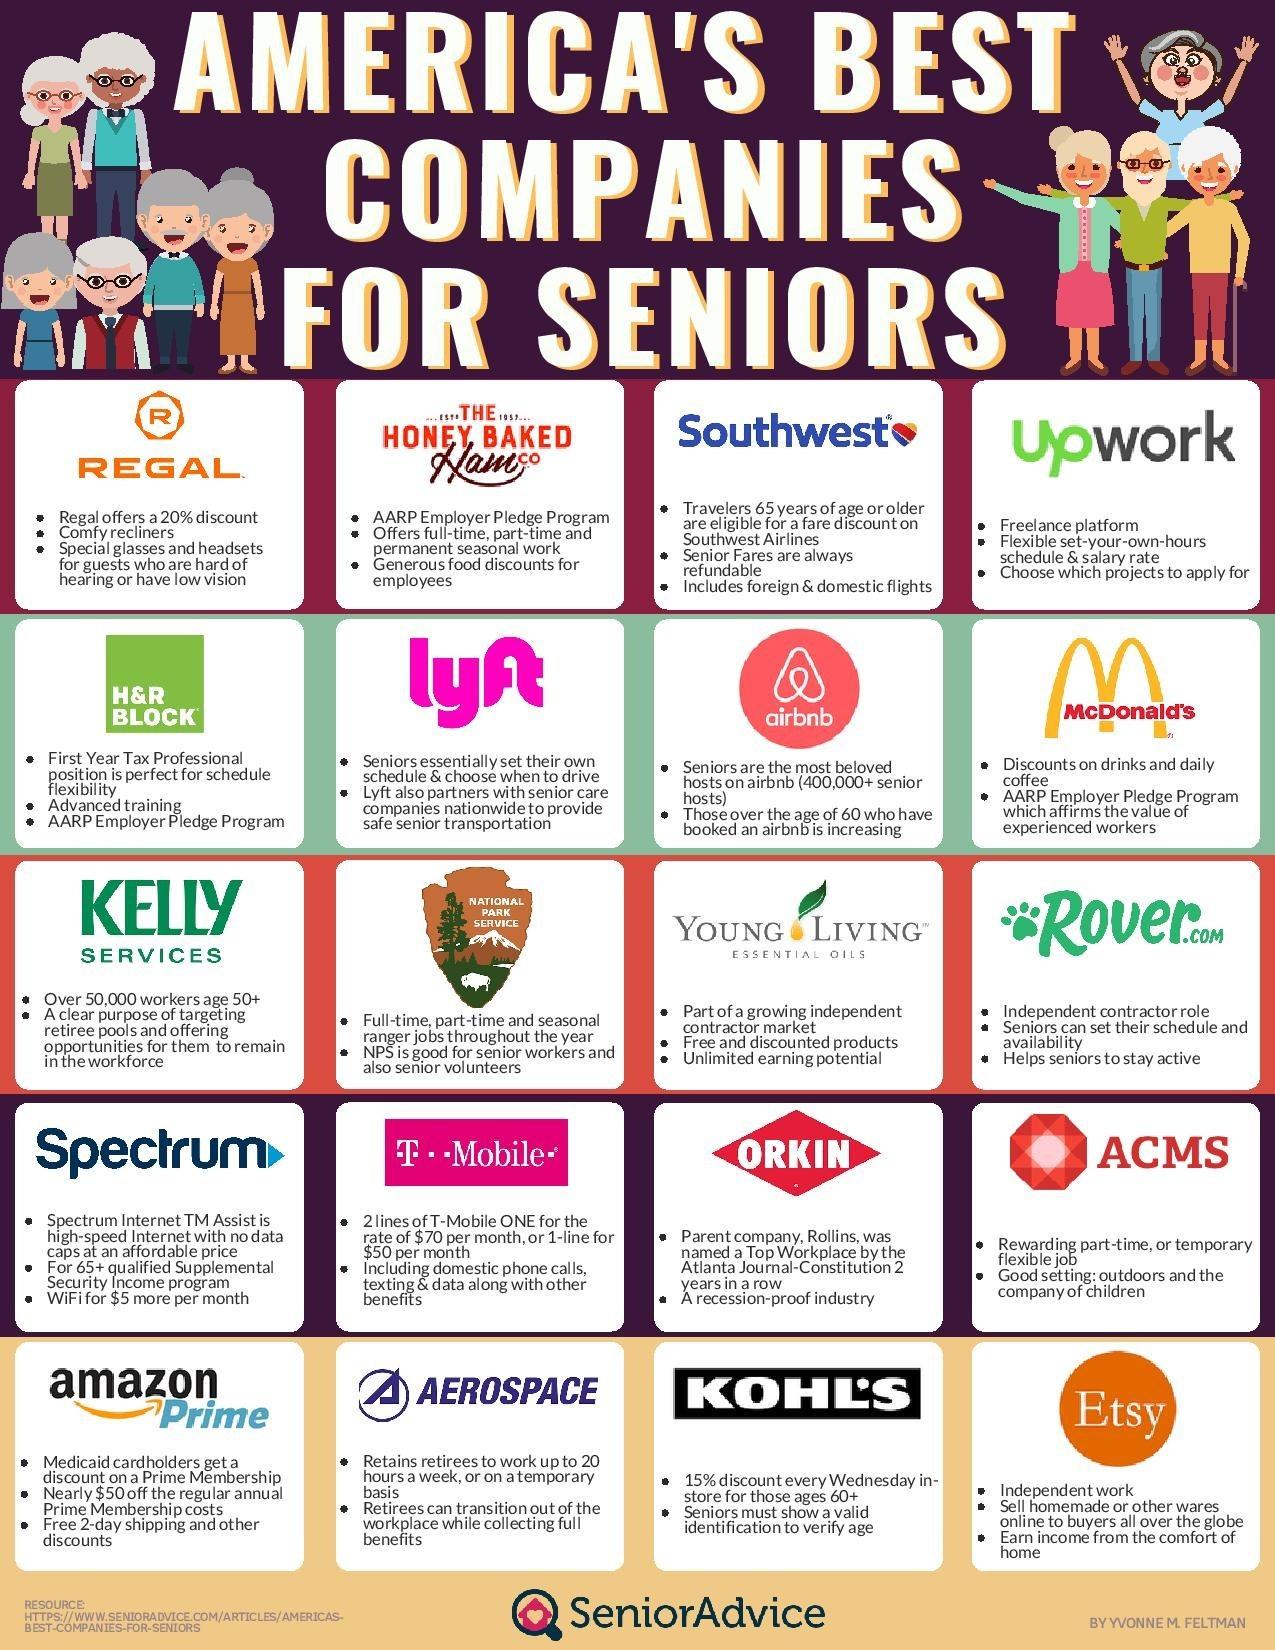 SeniorAdvice.com